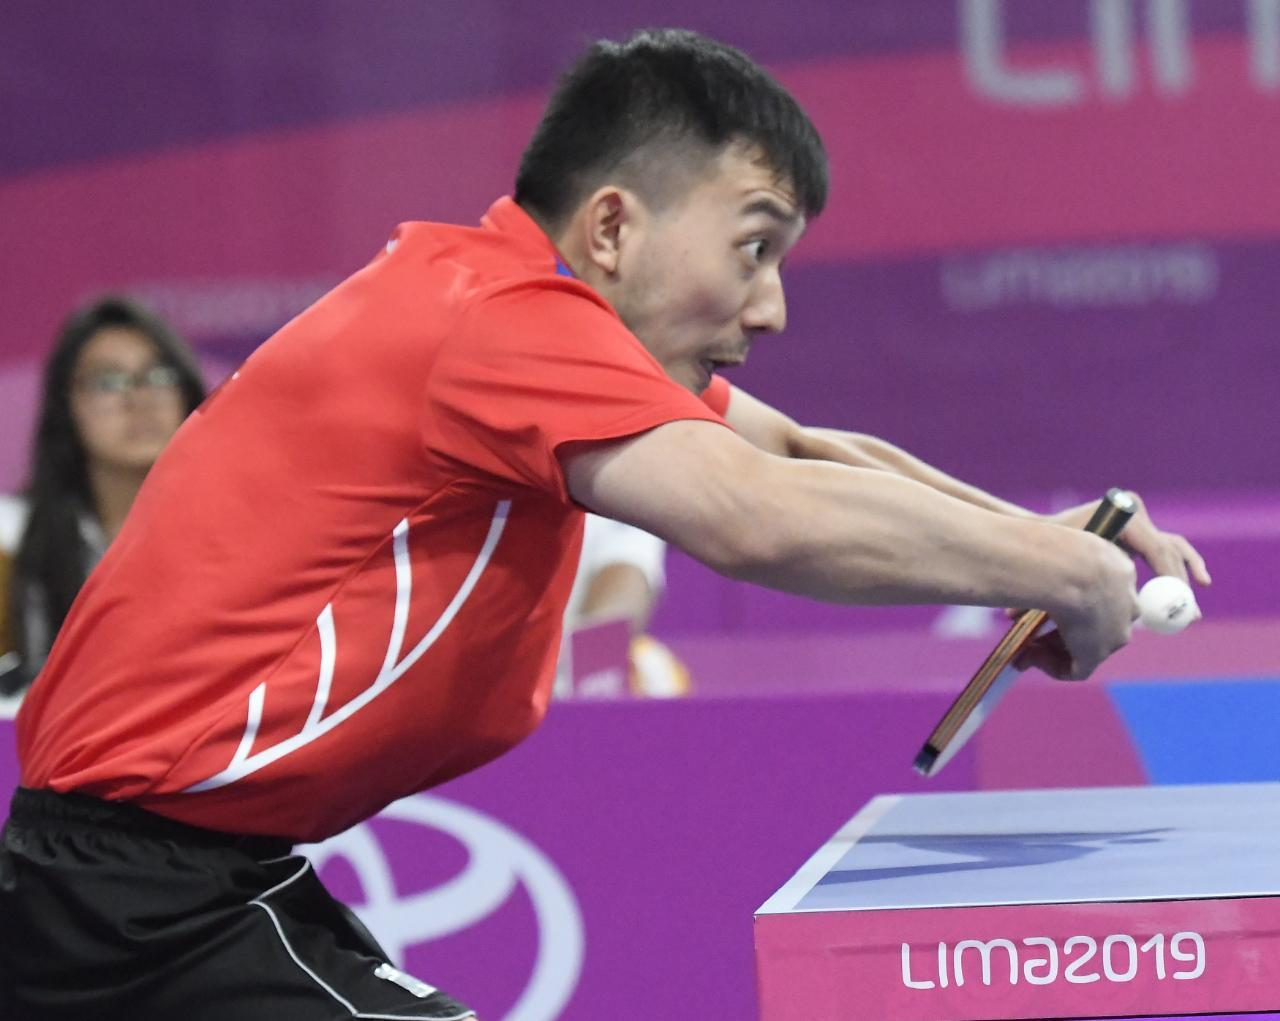 Jiaji buscará boleto Tokio en segunda ronda preolímpico tenis mesa